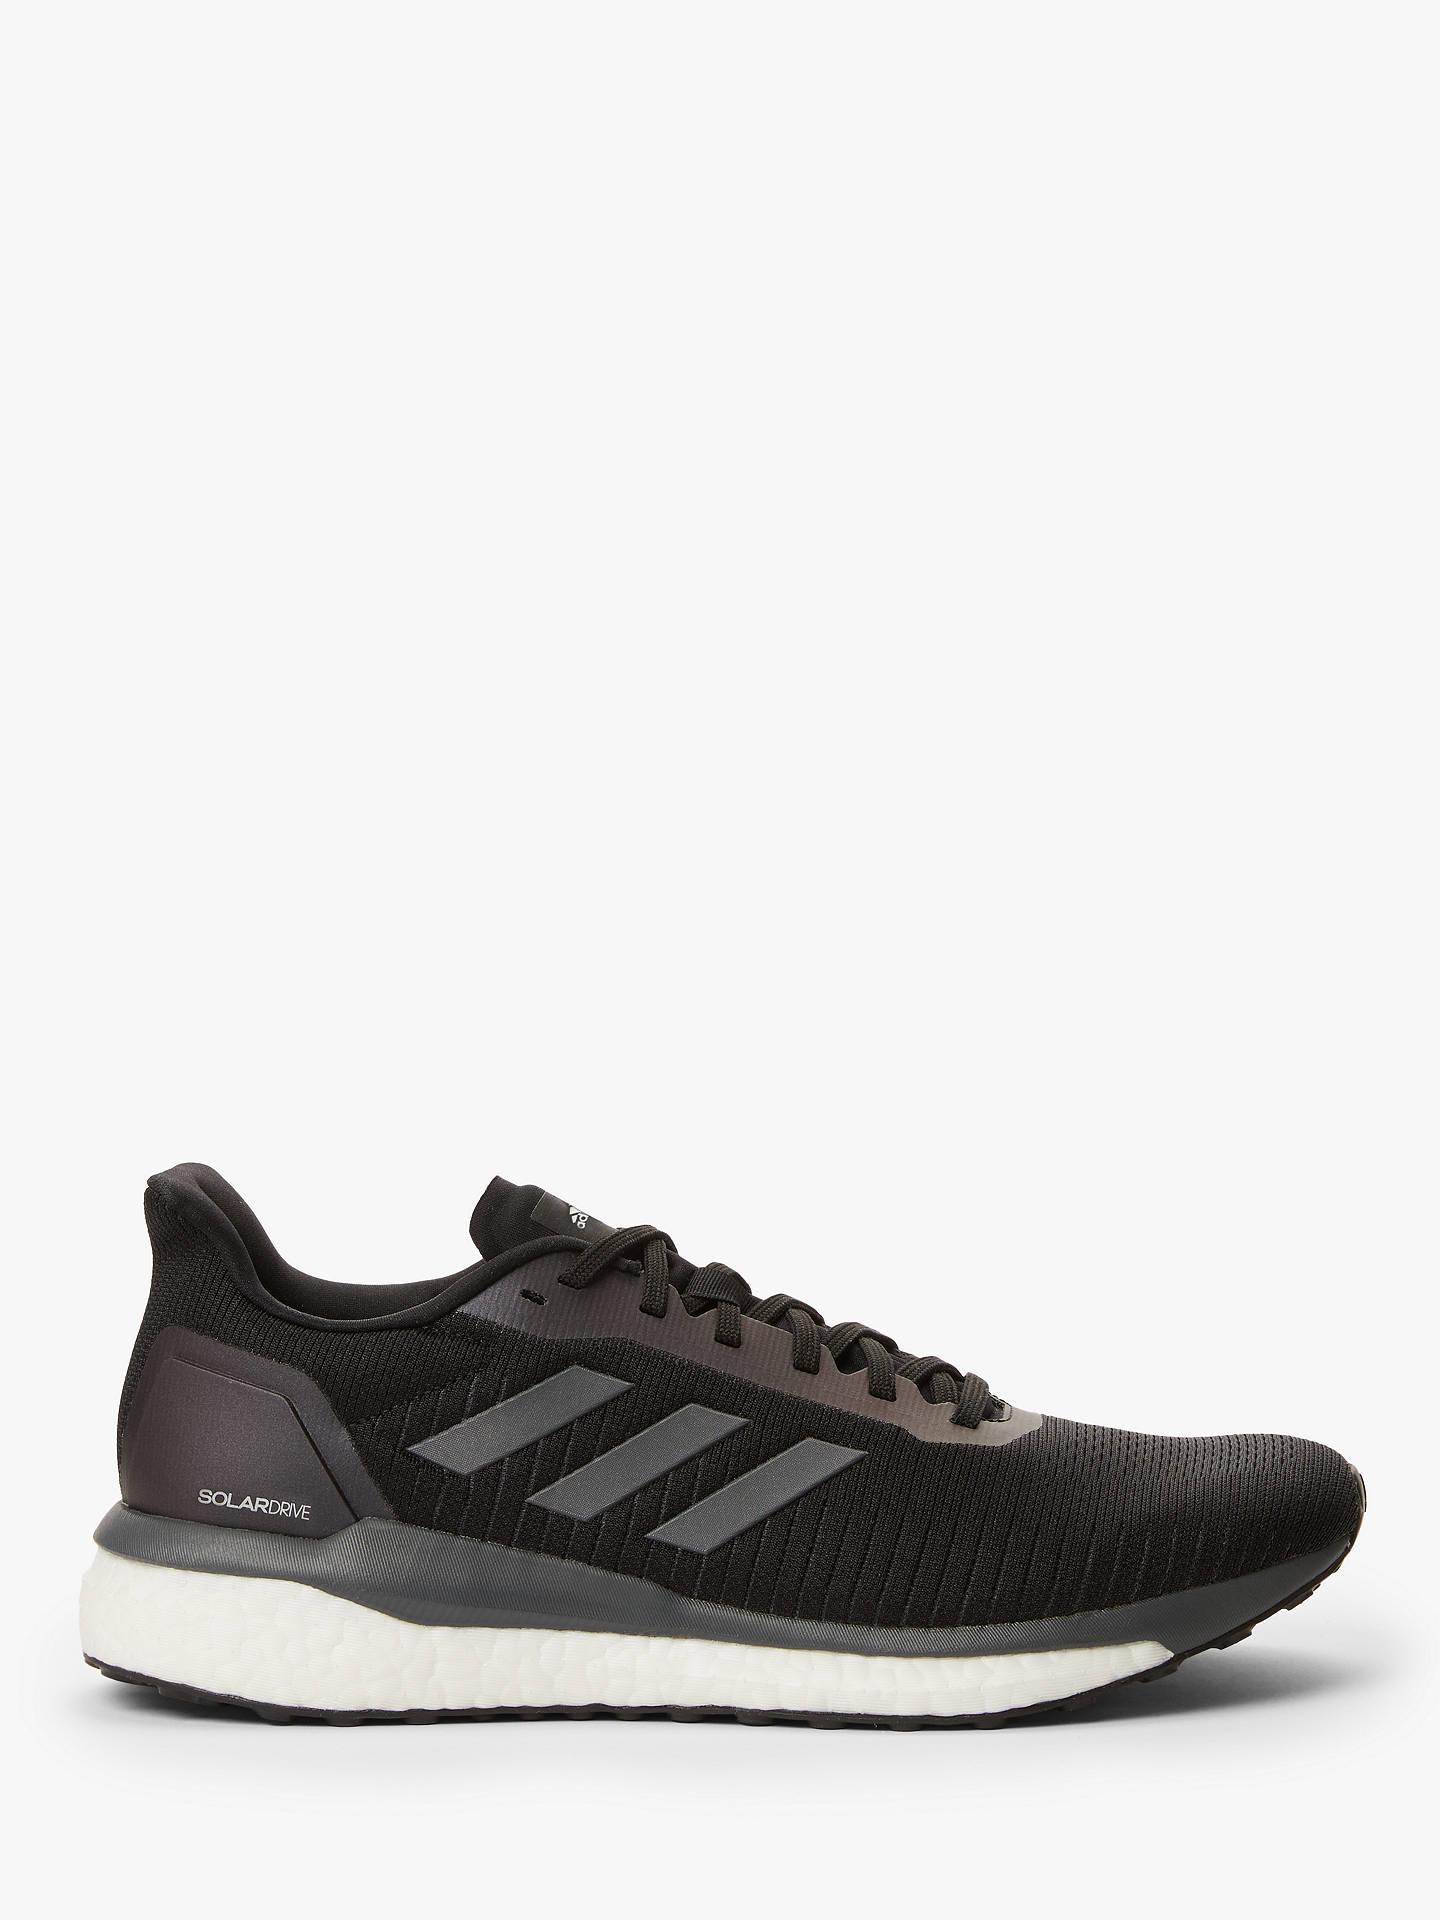 adidas Solar Drive Shoes UK 12.5 core blackftwr whit